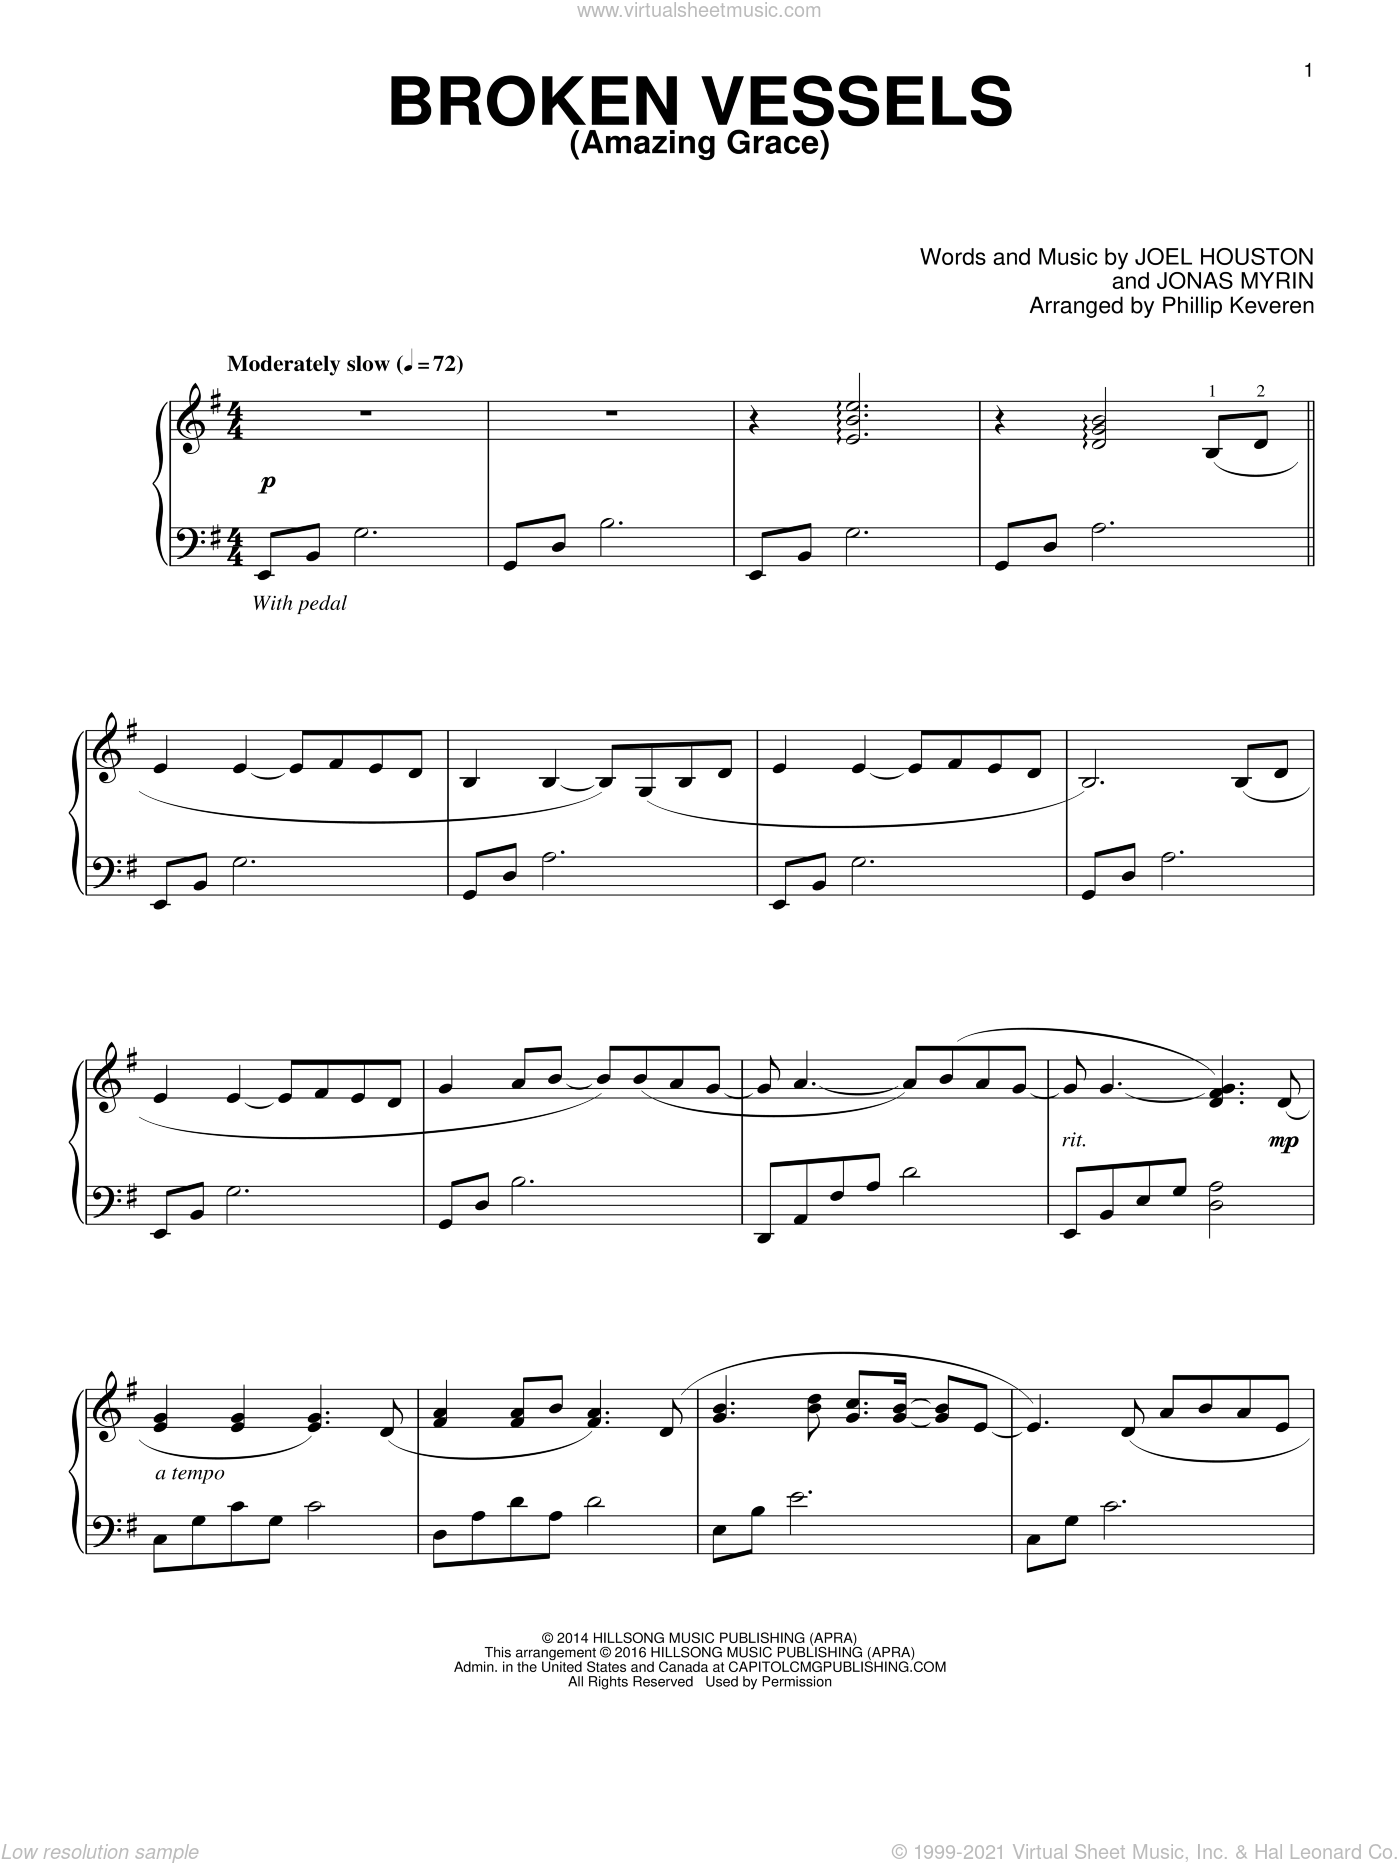 Broken Vessels (Amazing Grace) (arr. Phillip Keveren) sheet music for piano solo by Jonas Myrin, Phillip Keveren, Hillsong Worship and Joel Houston, intermediate skill level